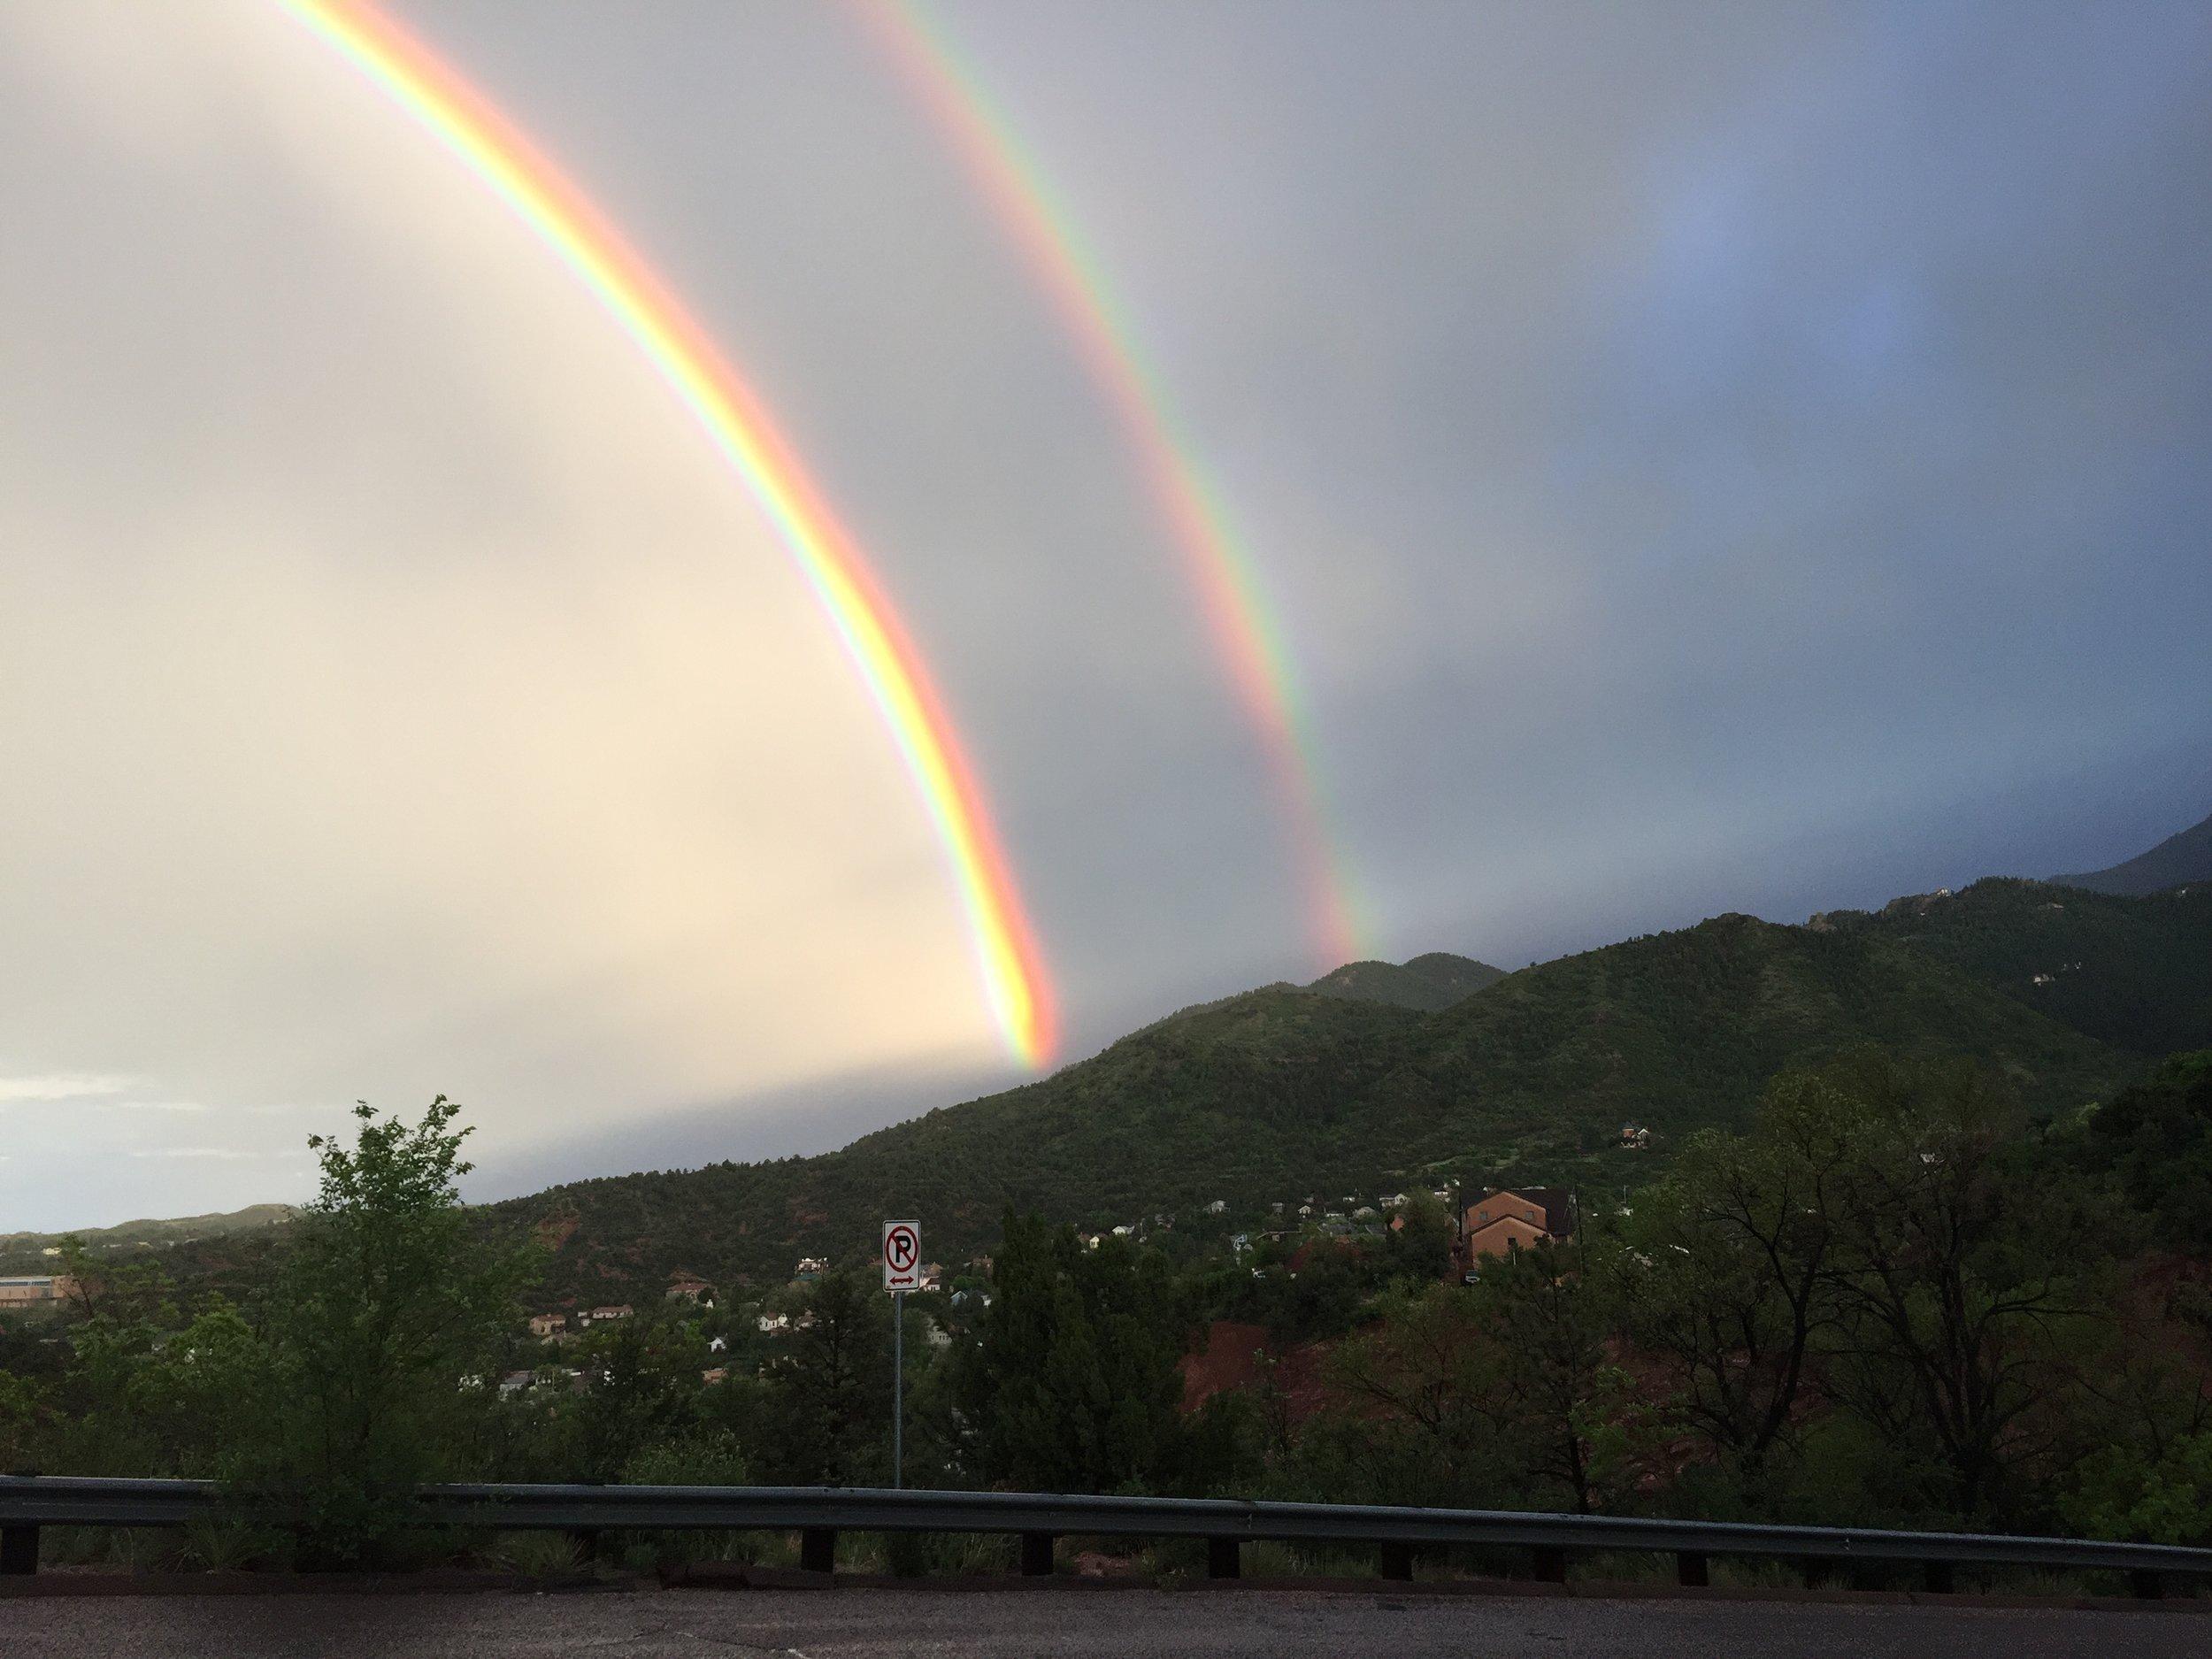 Rainbows over Manitou Springs, taken by Ken